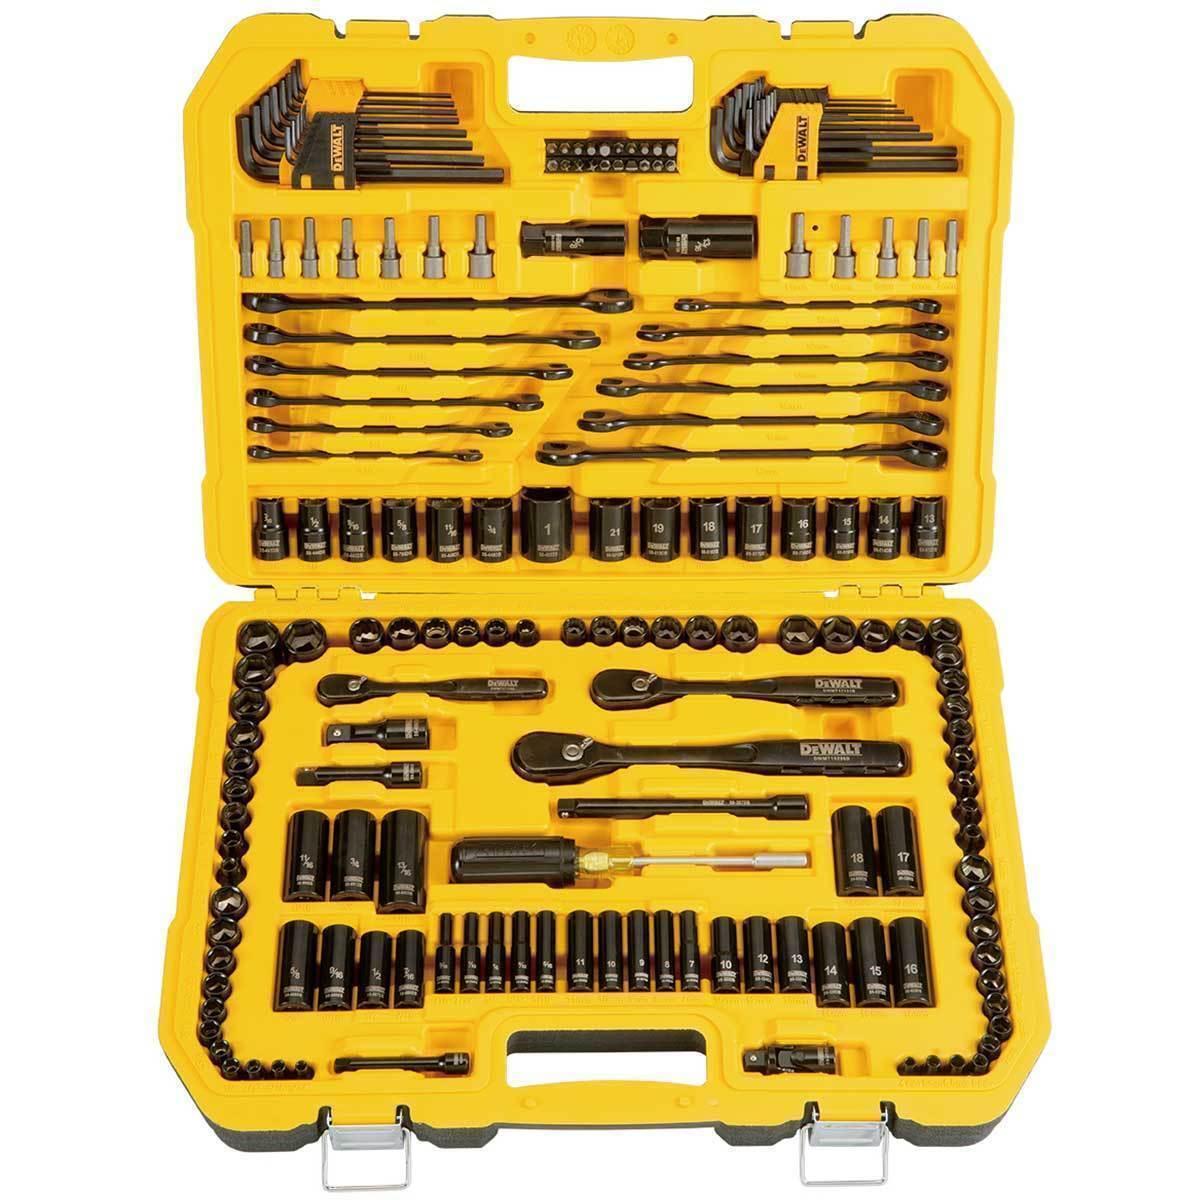 Dewalt tool set 181 dyson 6v cordless